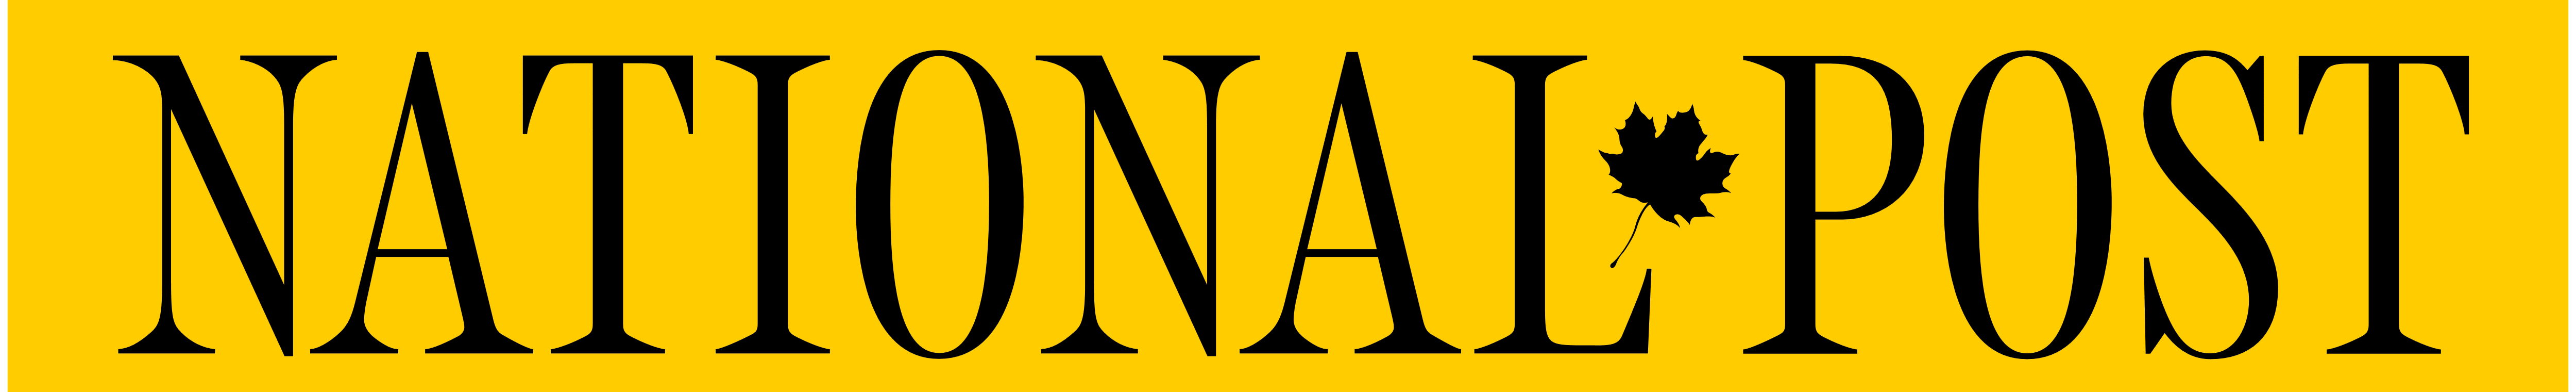 At 49, Celine Dion goes nude for Vogue   National Post